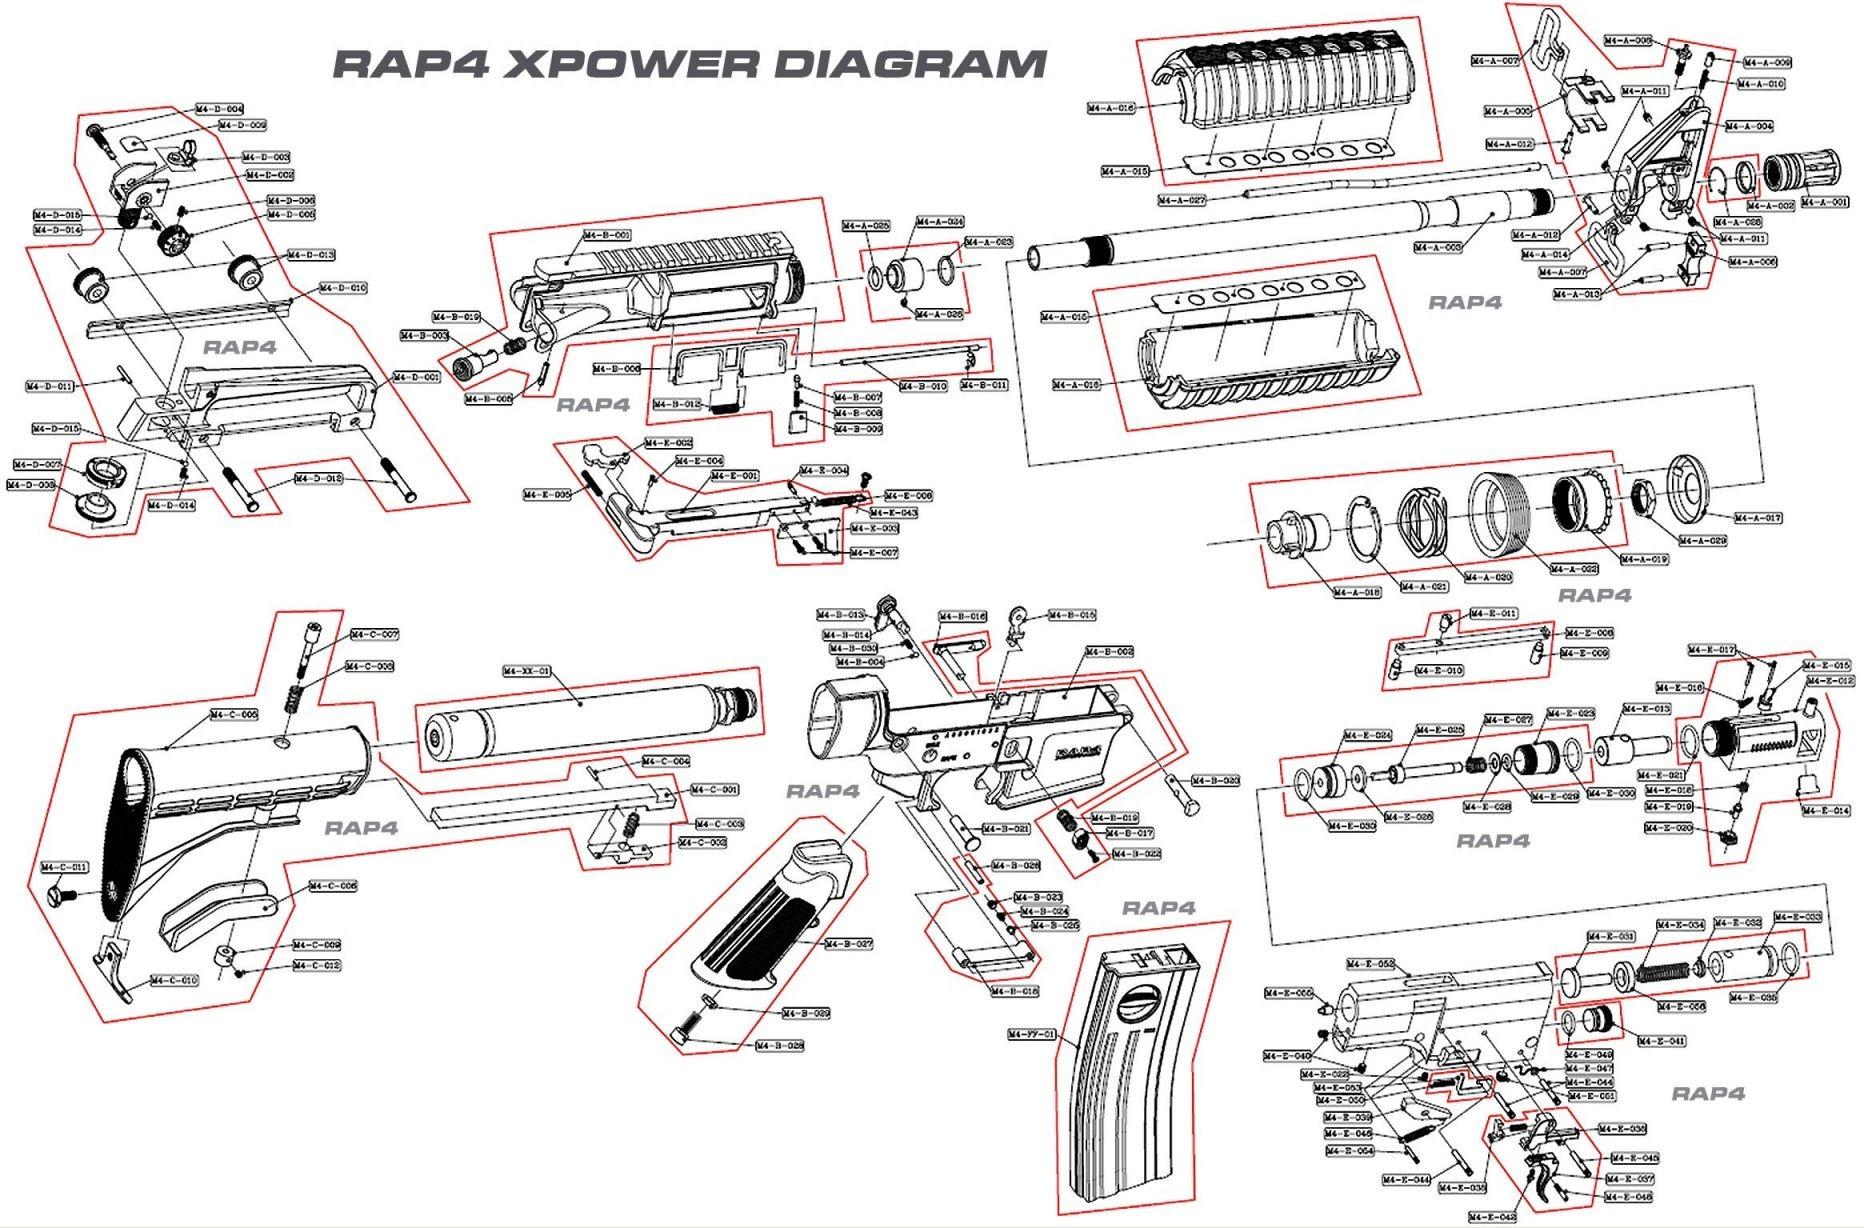 Car Exterior Body Parts Diagram Beautiful Automobile Body Parts Diagram Eq69 – Documentaries for Change Of Car Exterior Body Parts Diagram